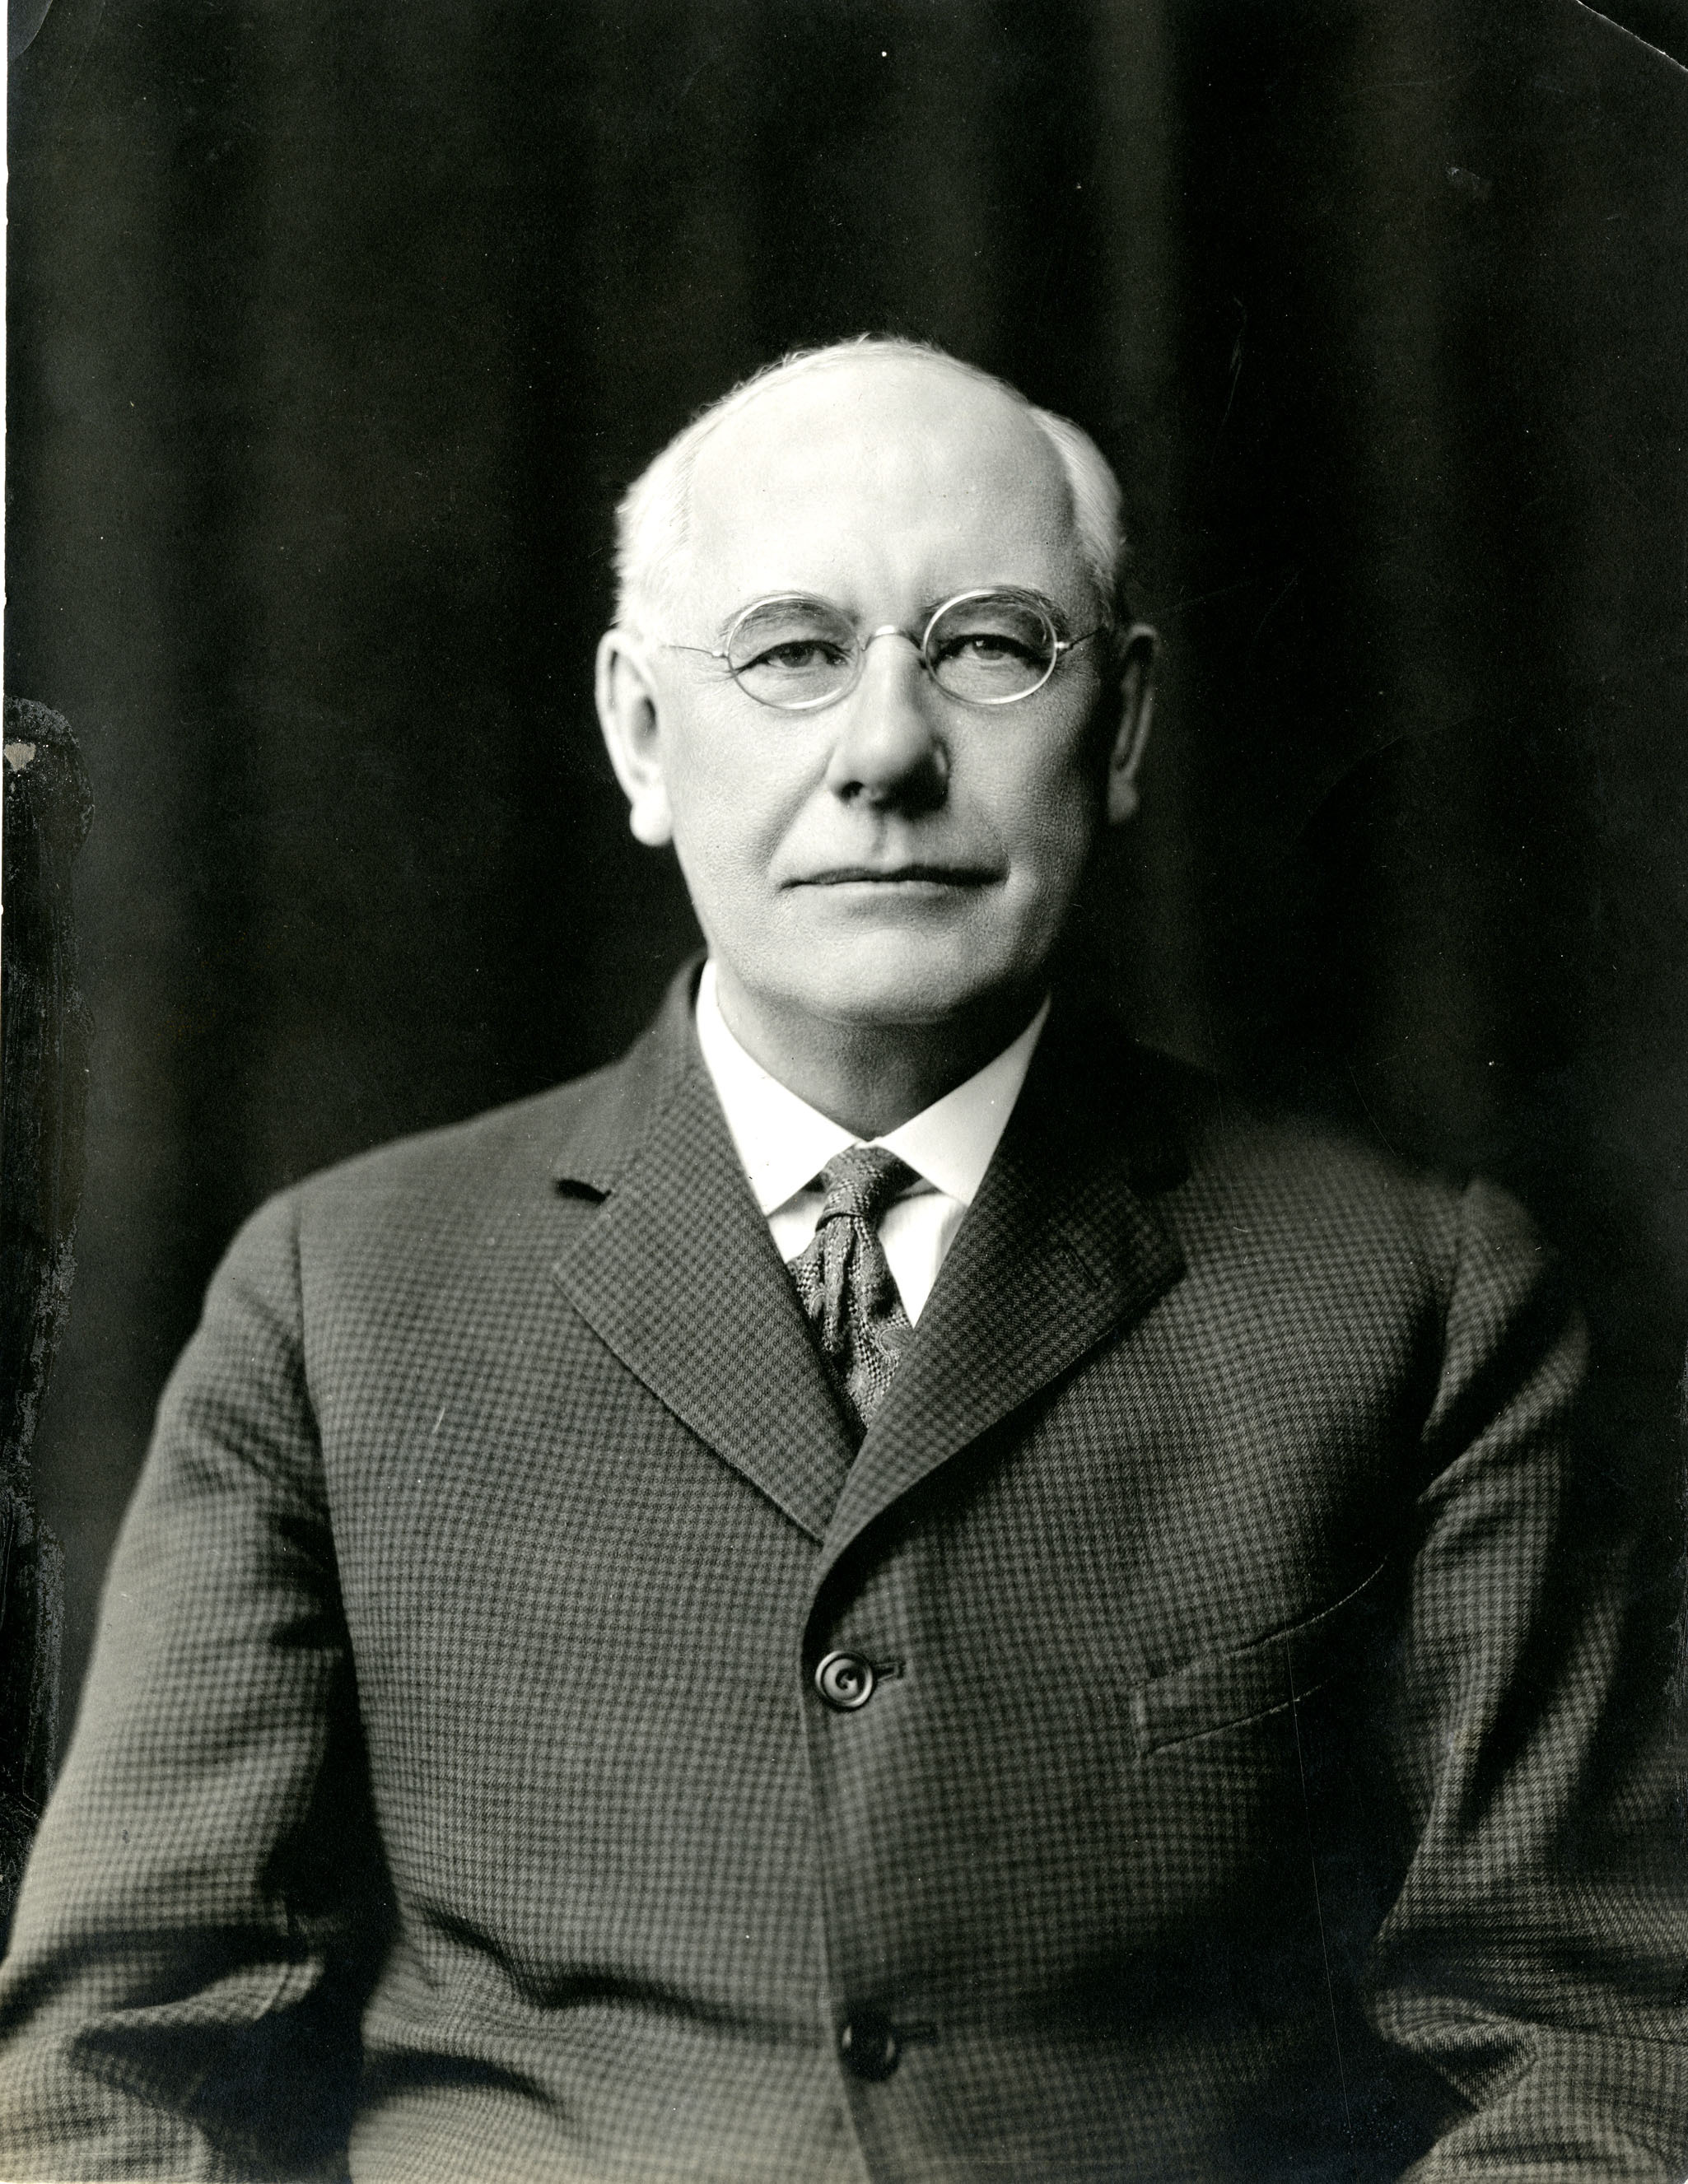 Samuel Avery portrait